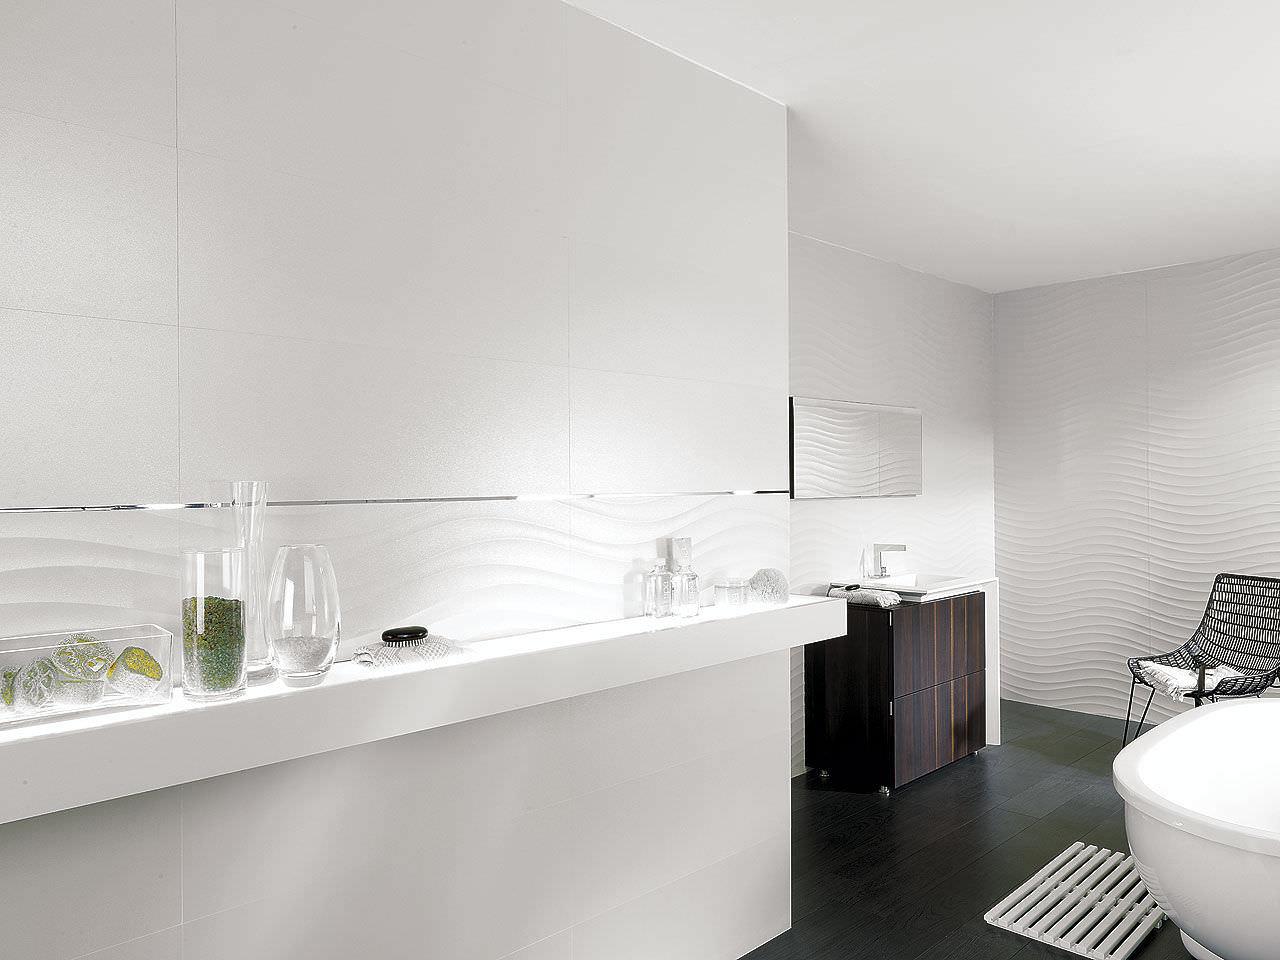 indoor-tile-bathrooms-wall-ceramic-12-6406071